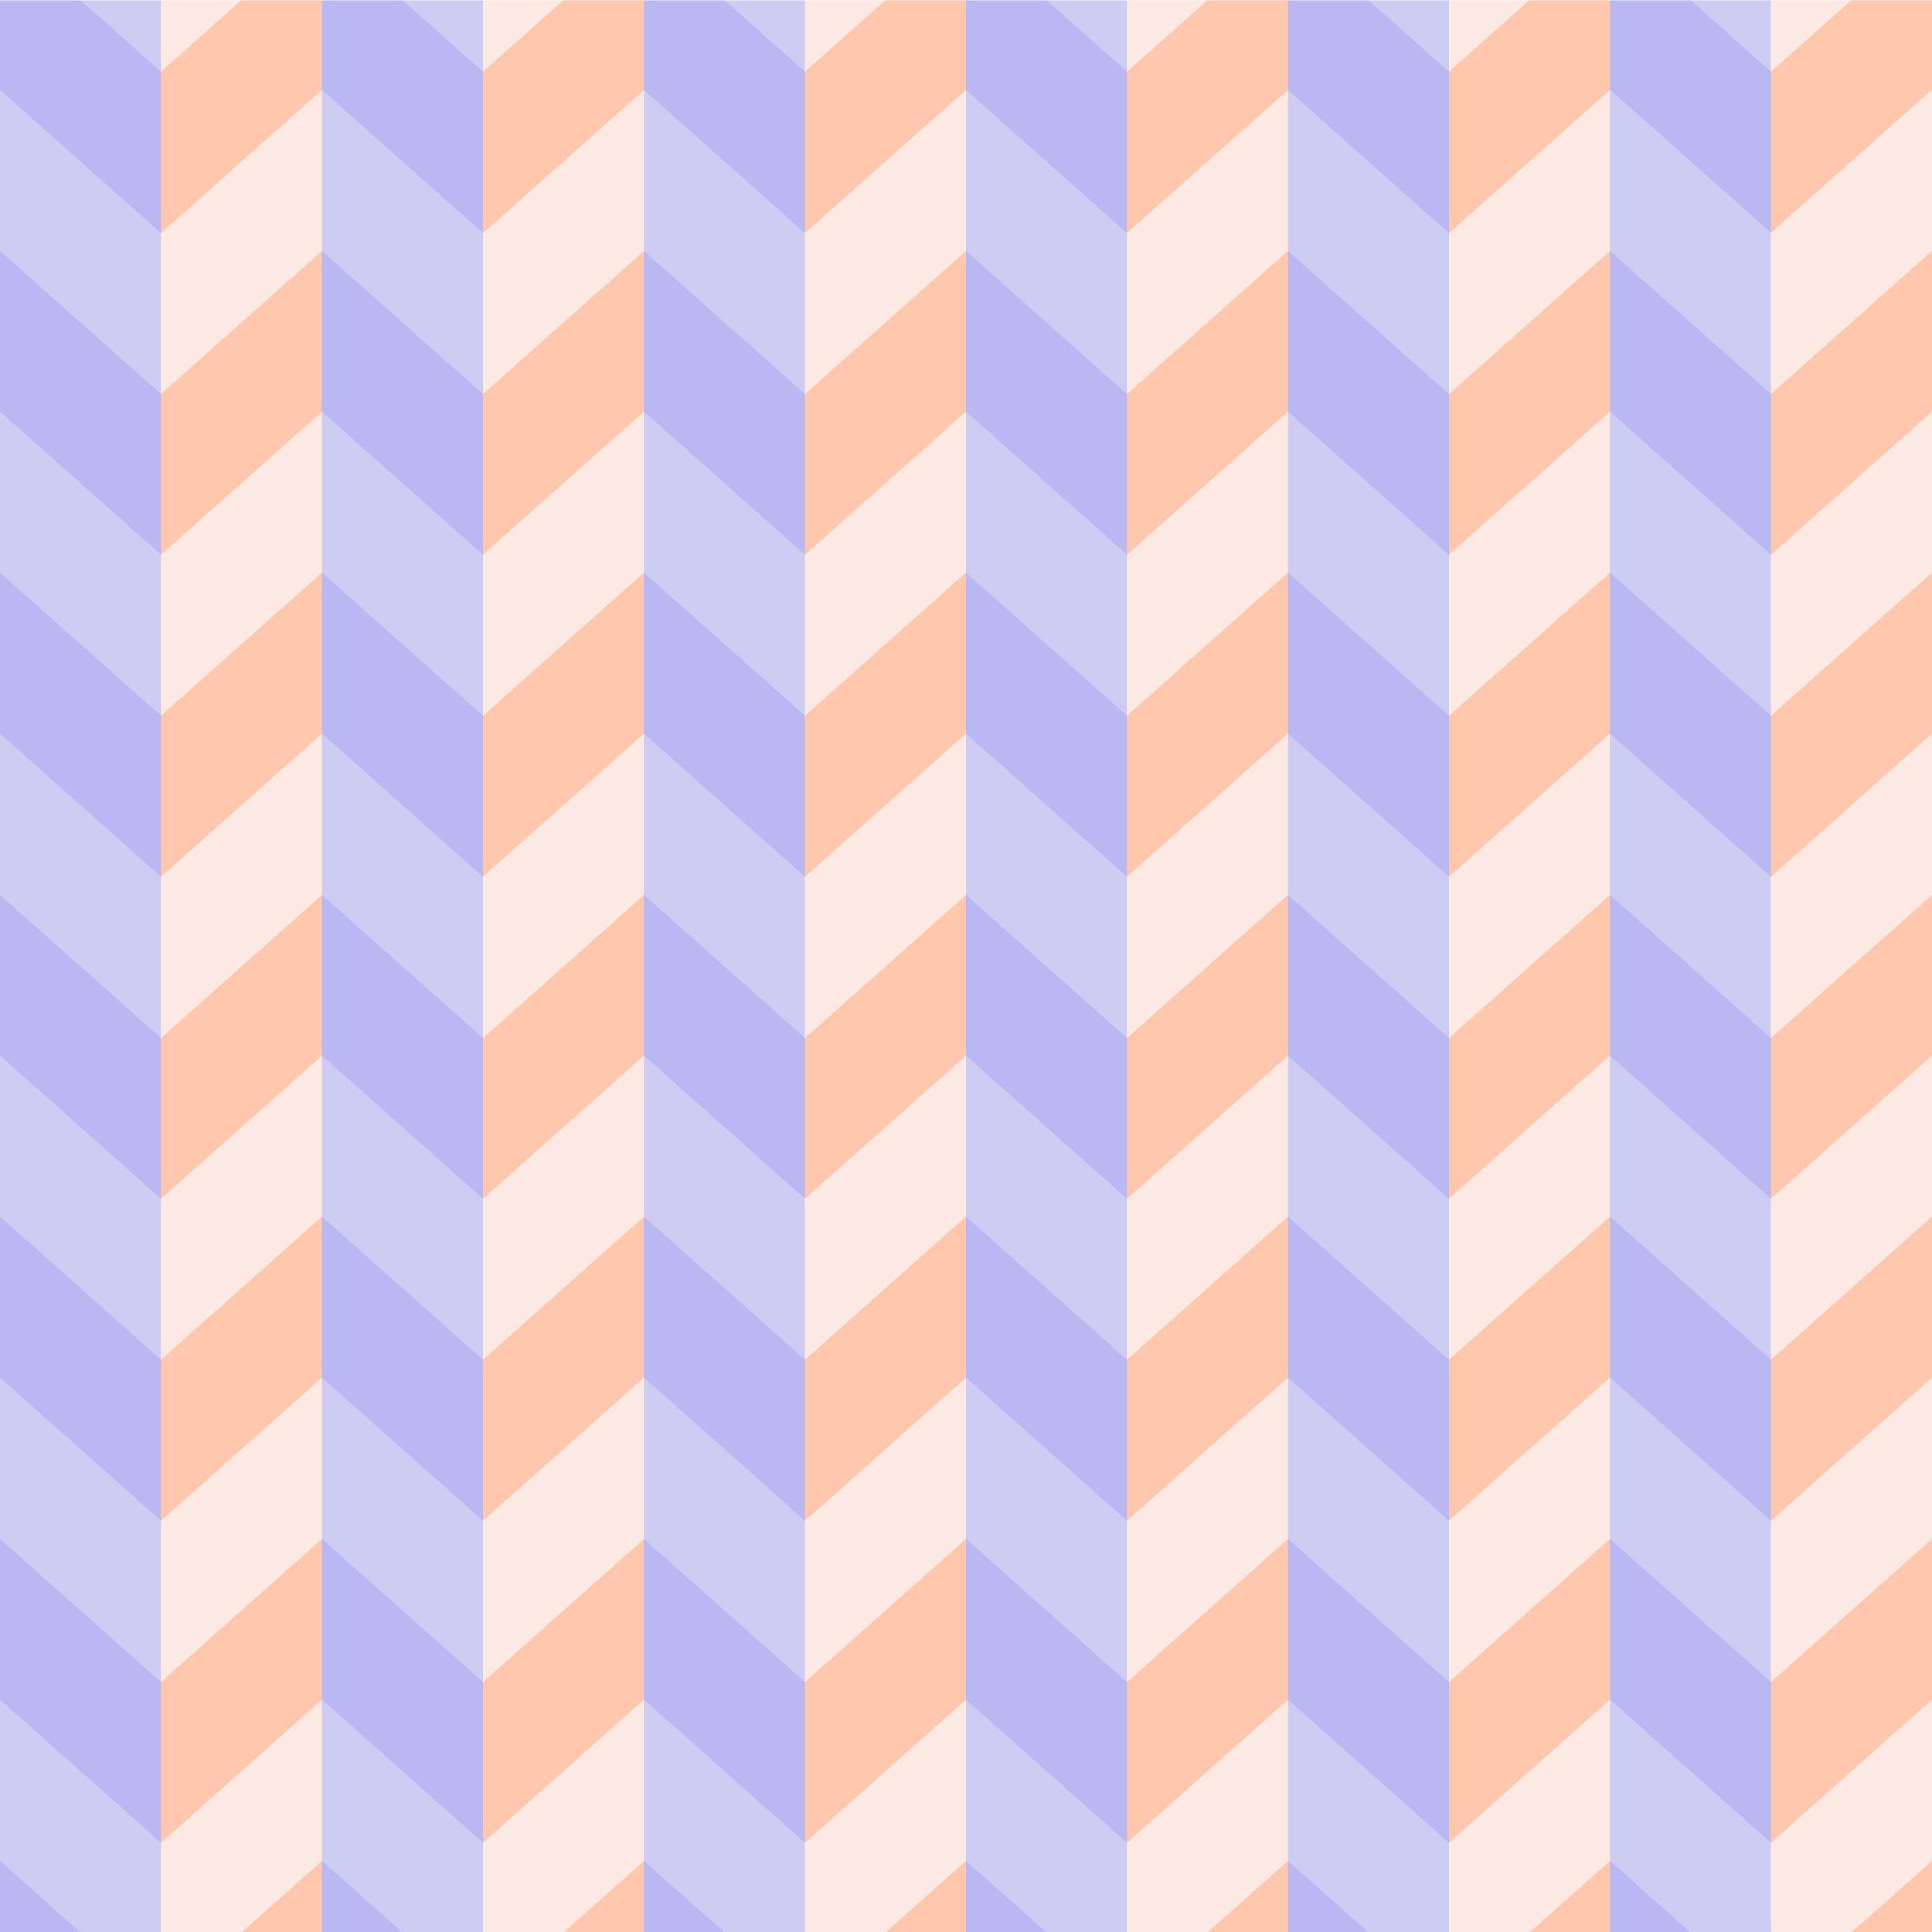 Seamless Pastel 3D Zigzag Pattern